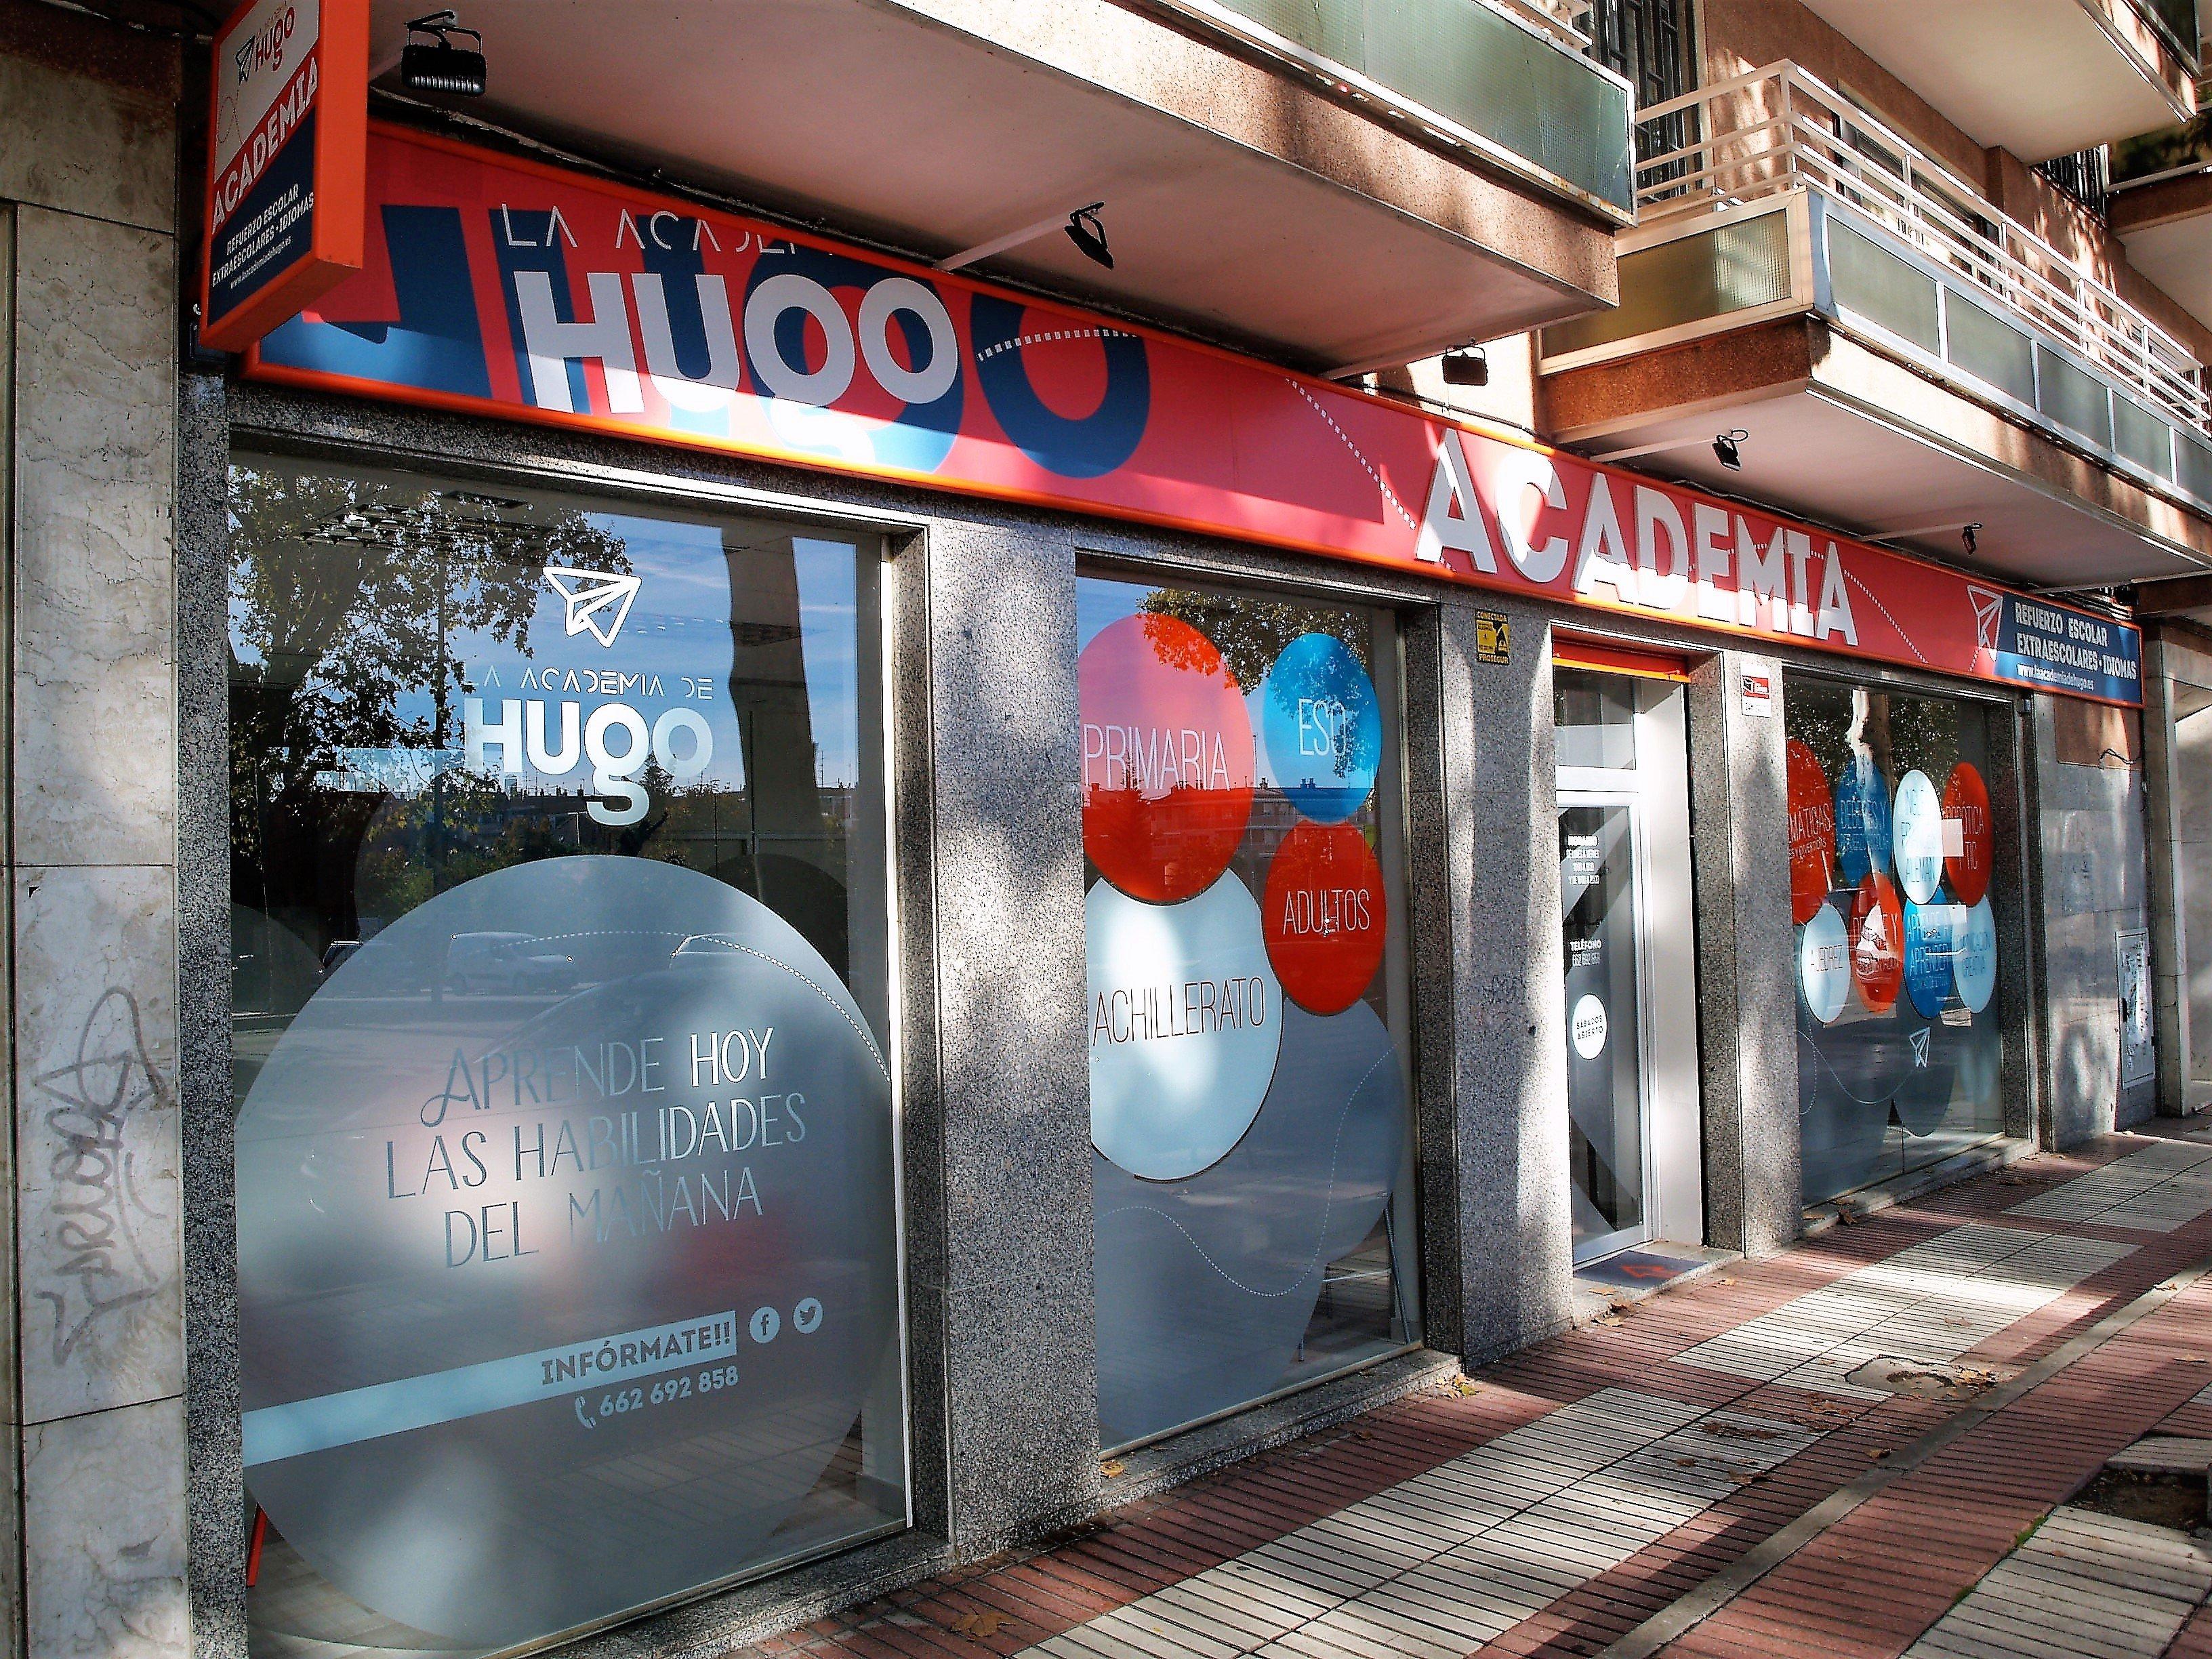 La Academia de Hugo